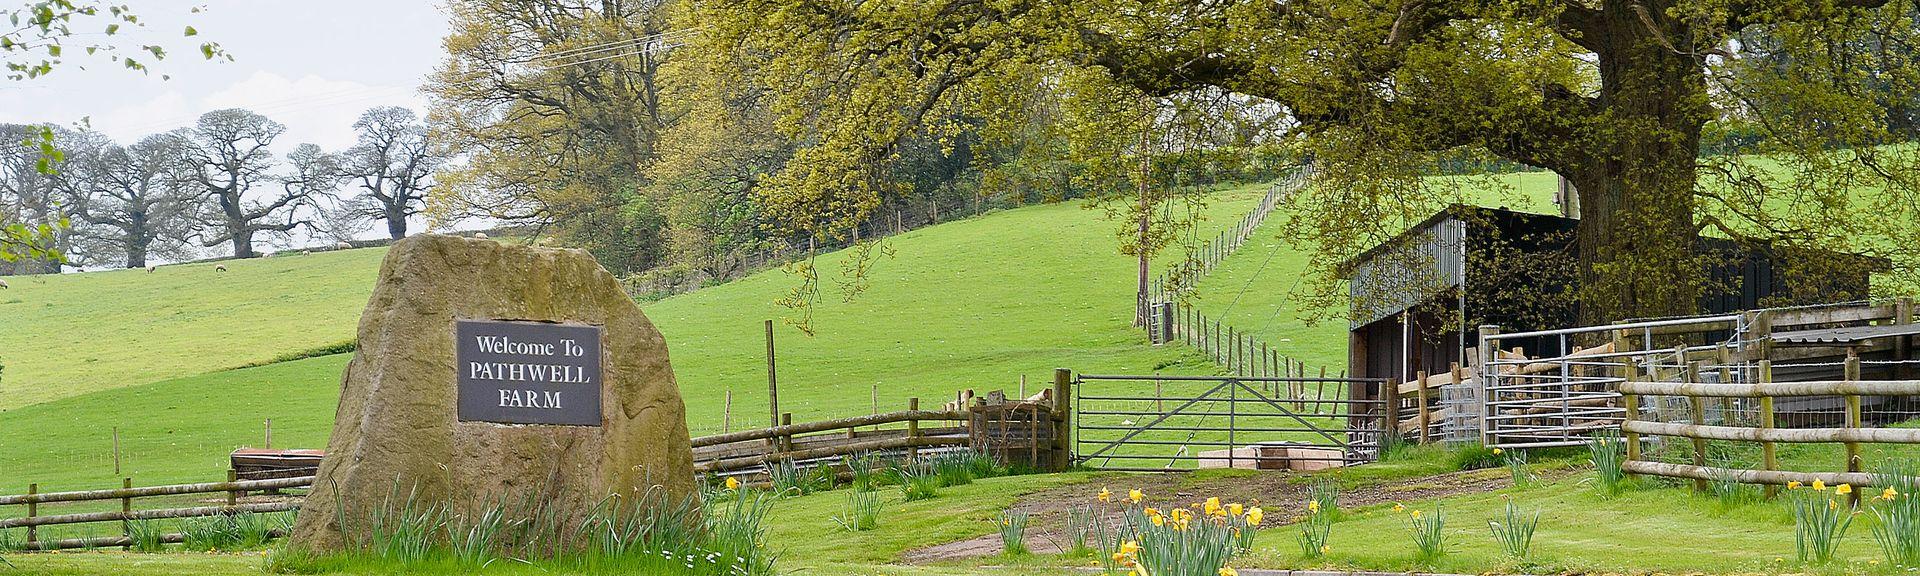 Dursley, Englanti, Yhdistynyt Kuningaskunta